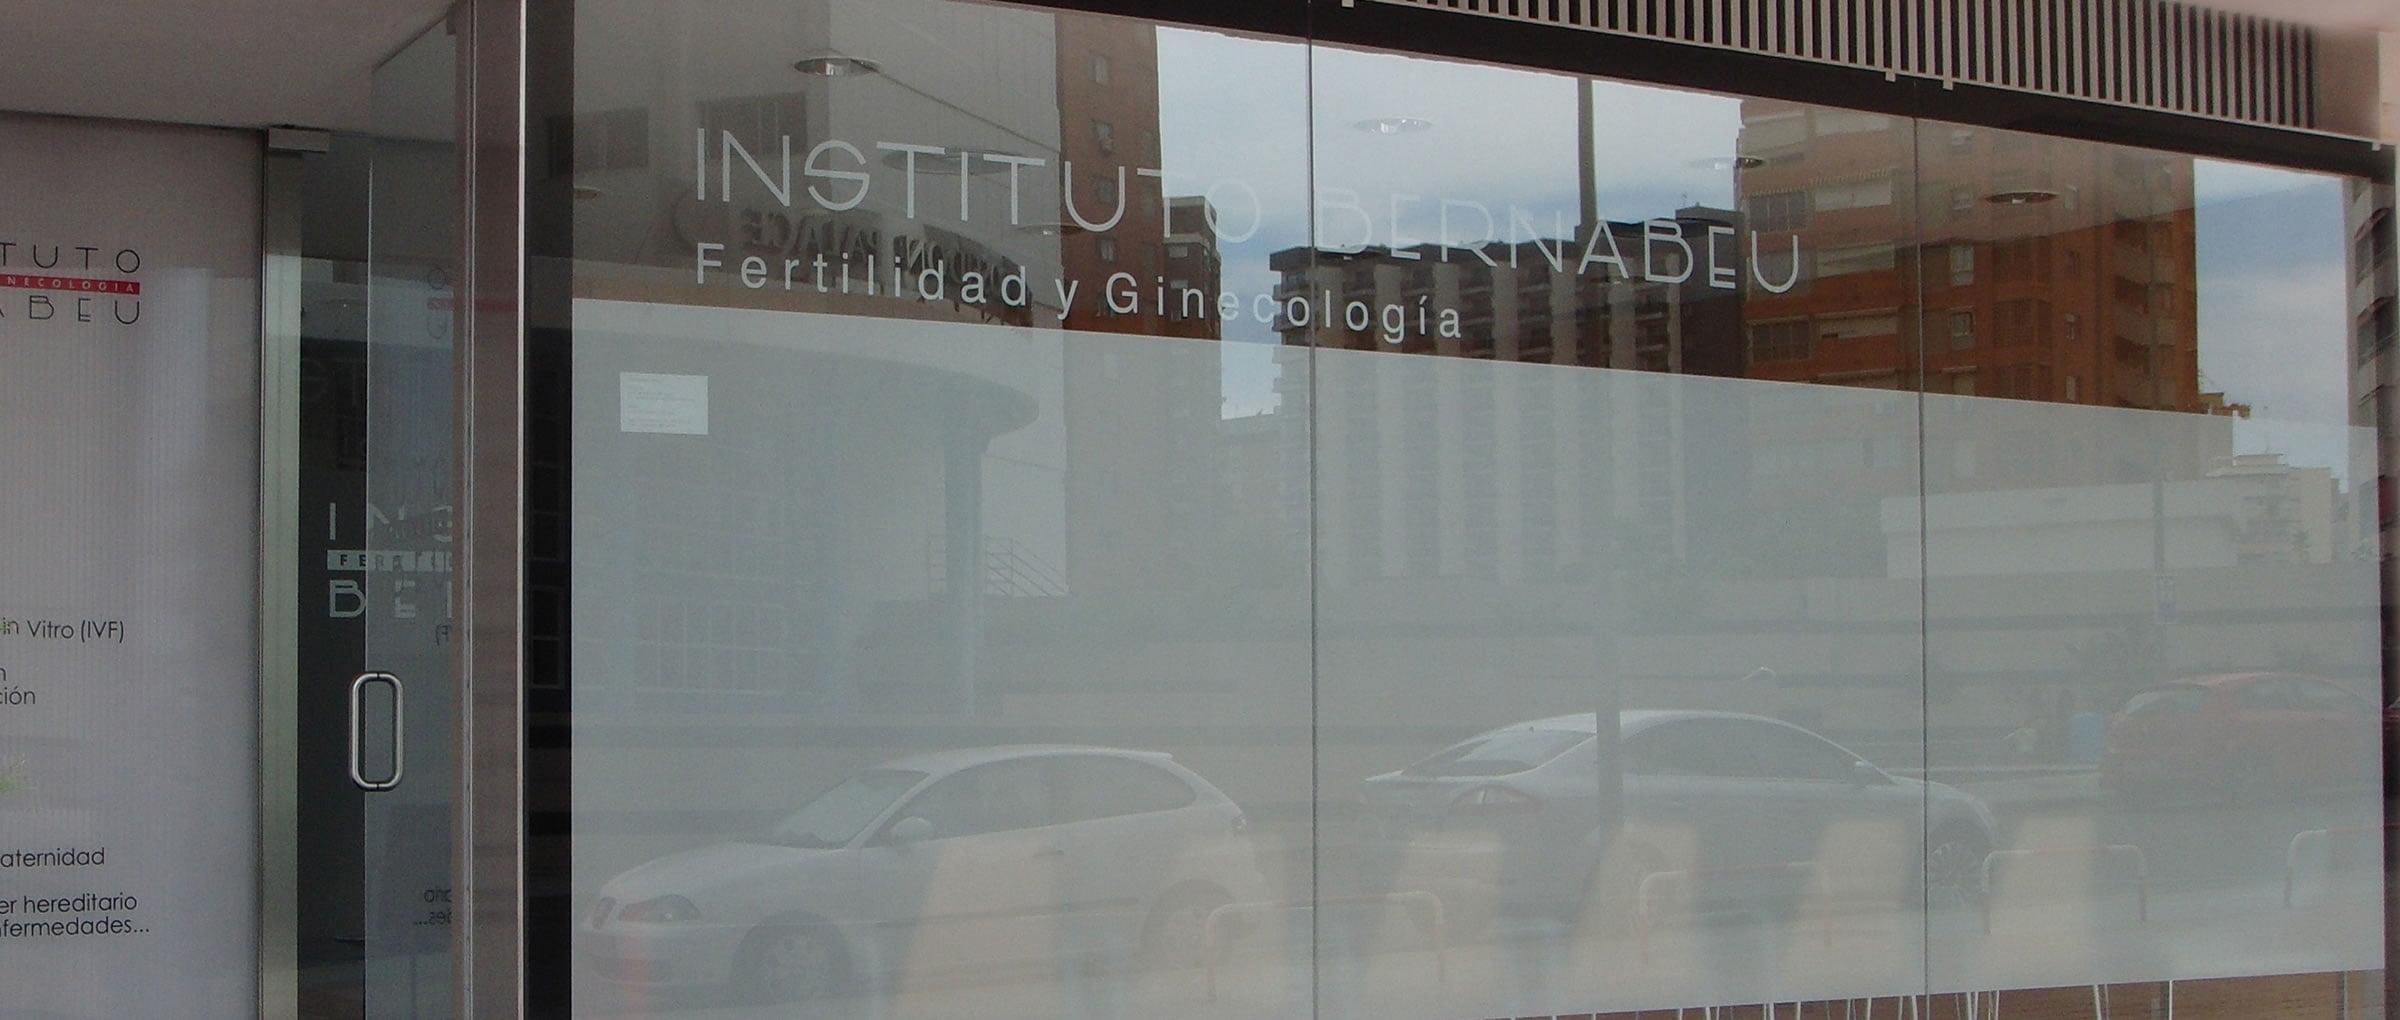 Instituto Bernabeu Benidorm